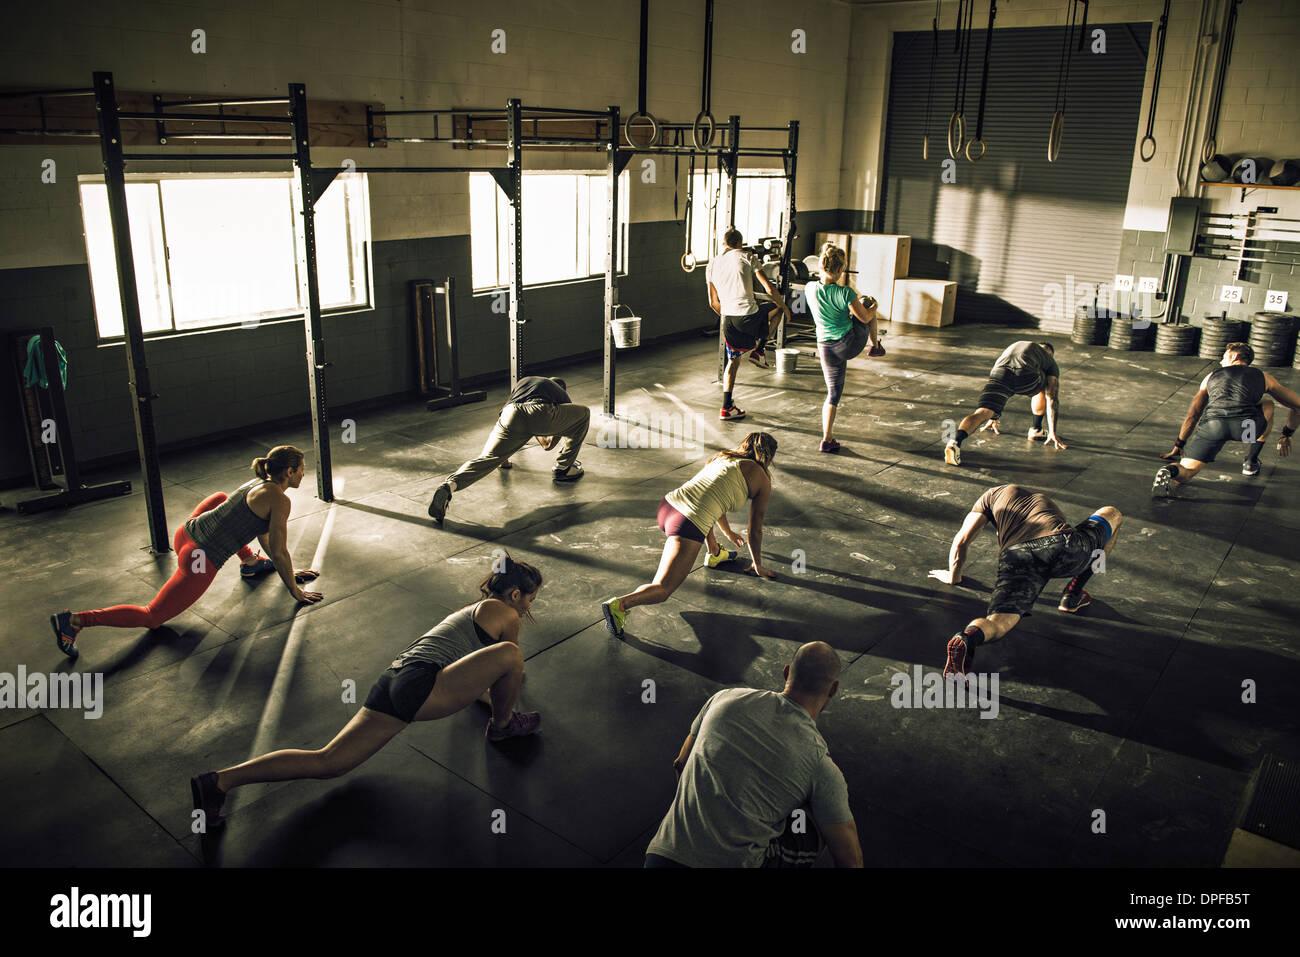 Lezione di fitness training e stretching insieme in palestra Immagini Stock